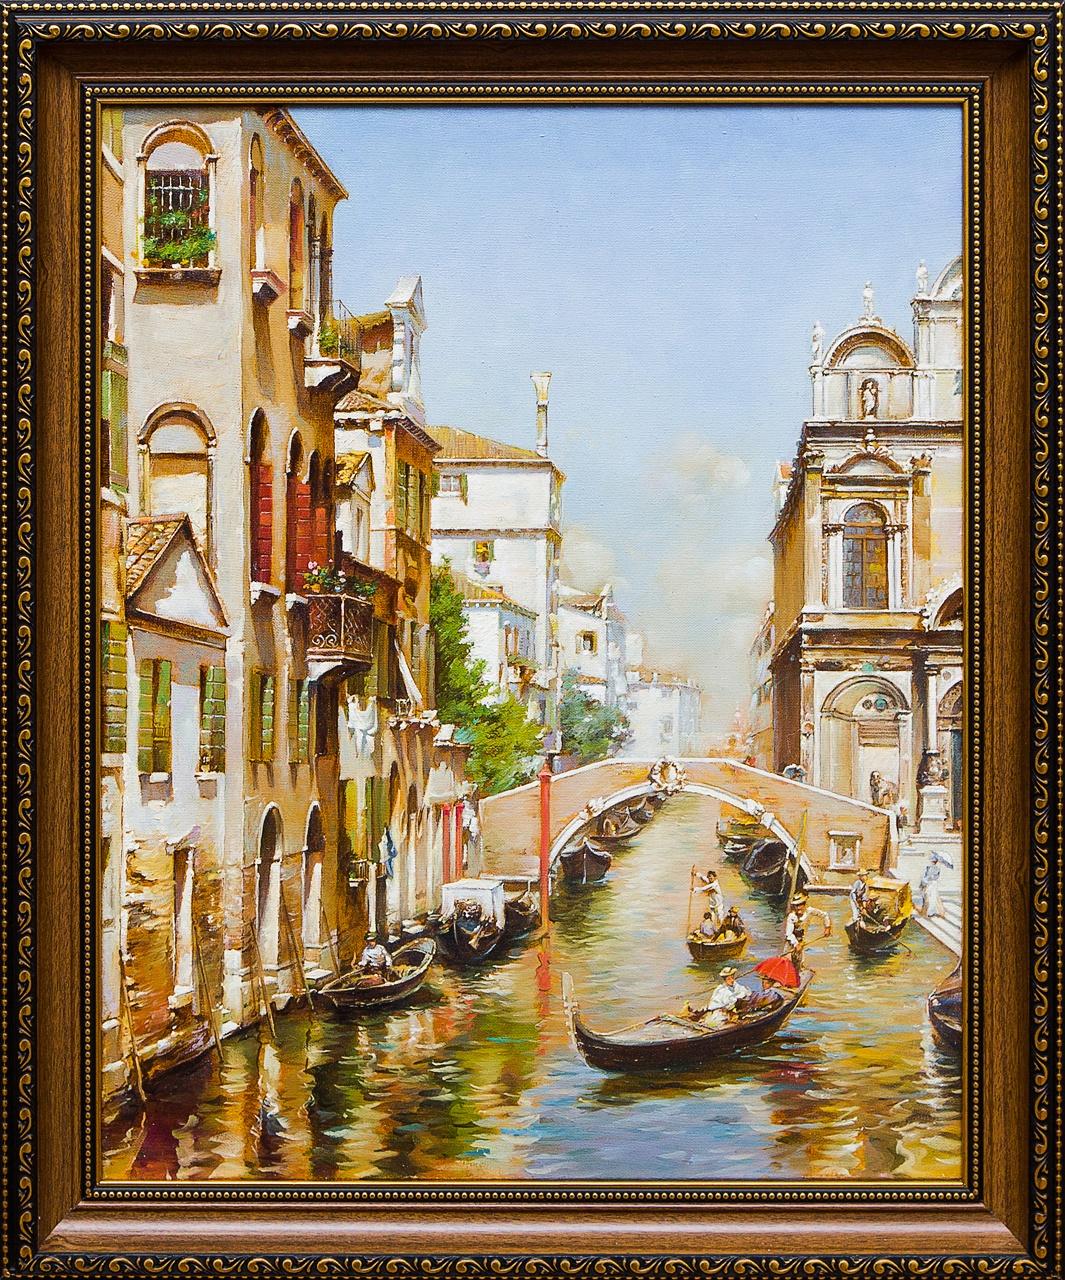 Венецианский канал е катерли некрасов